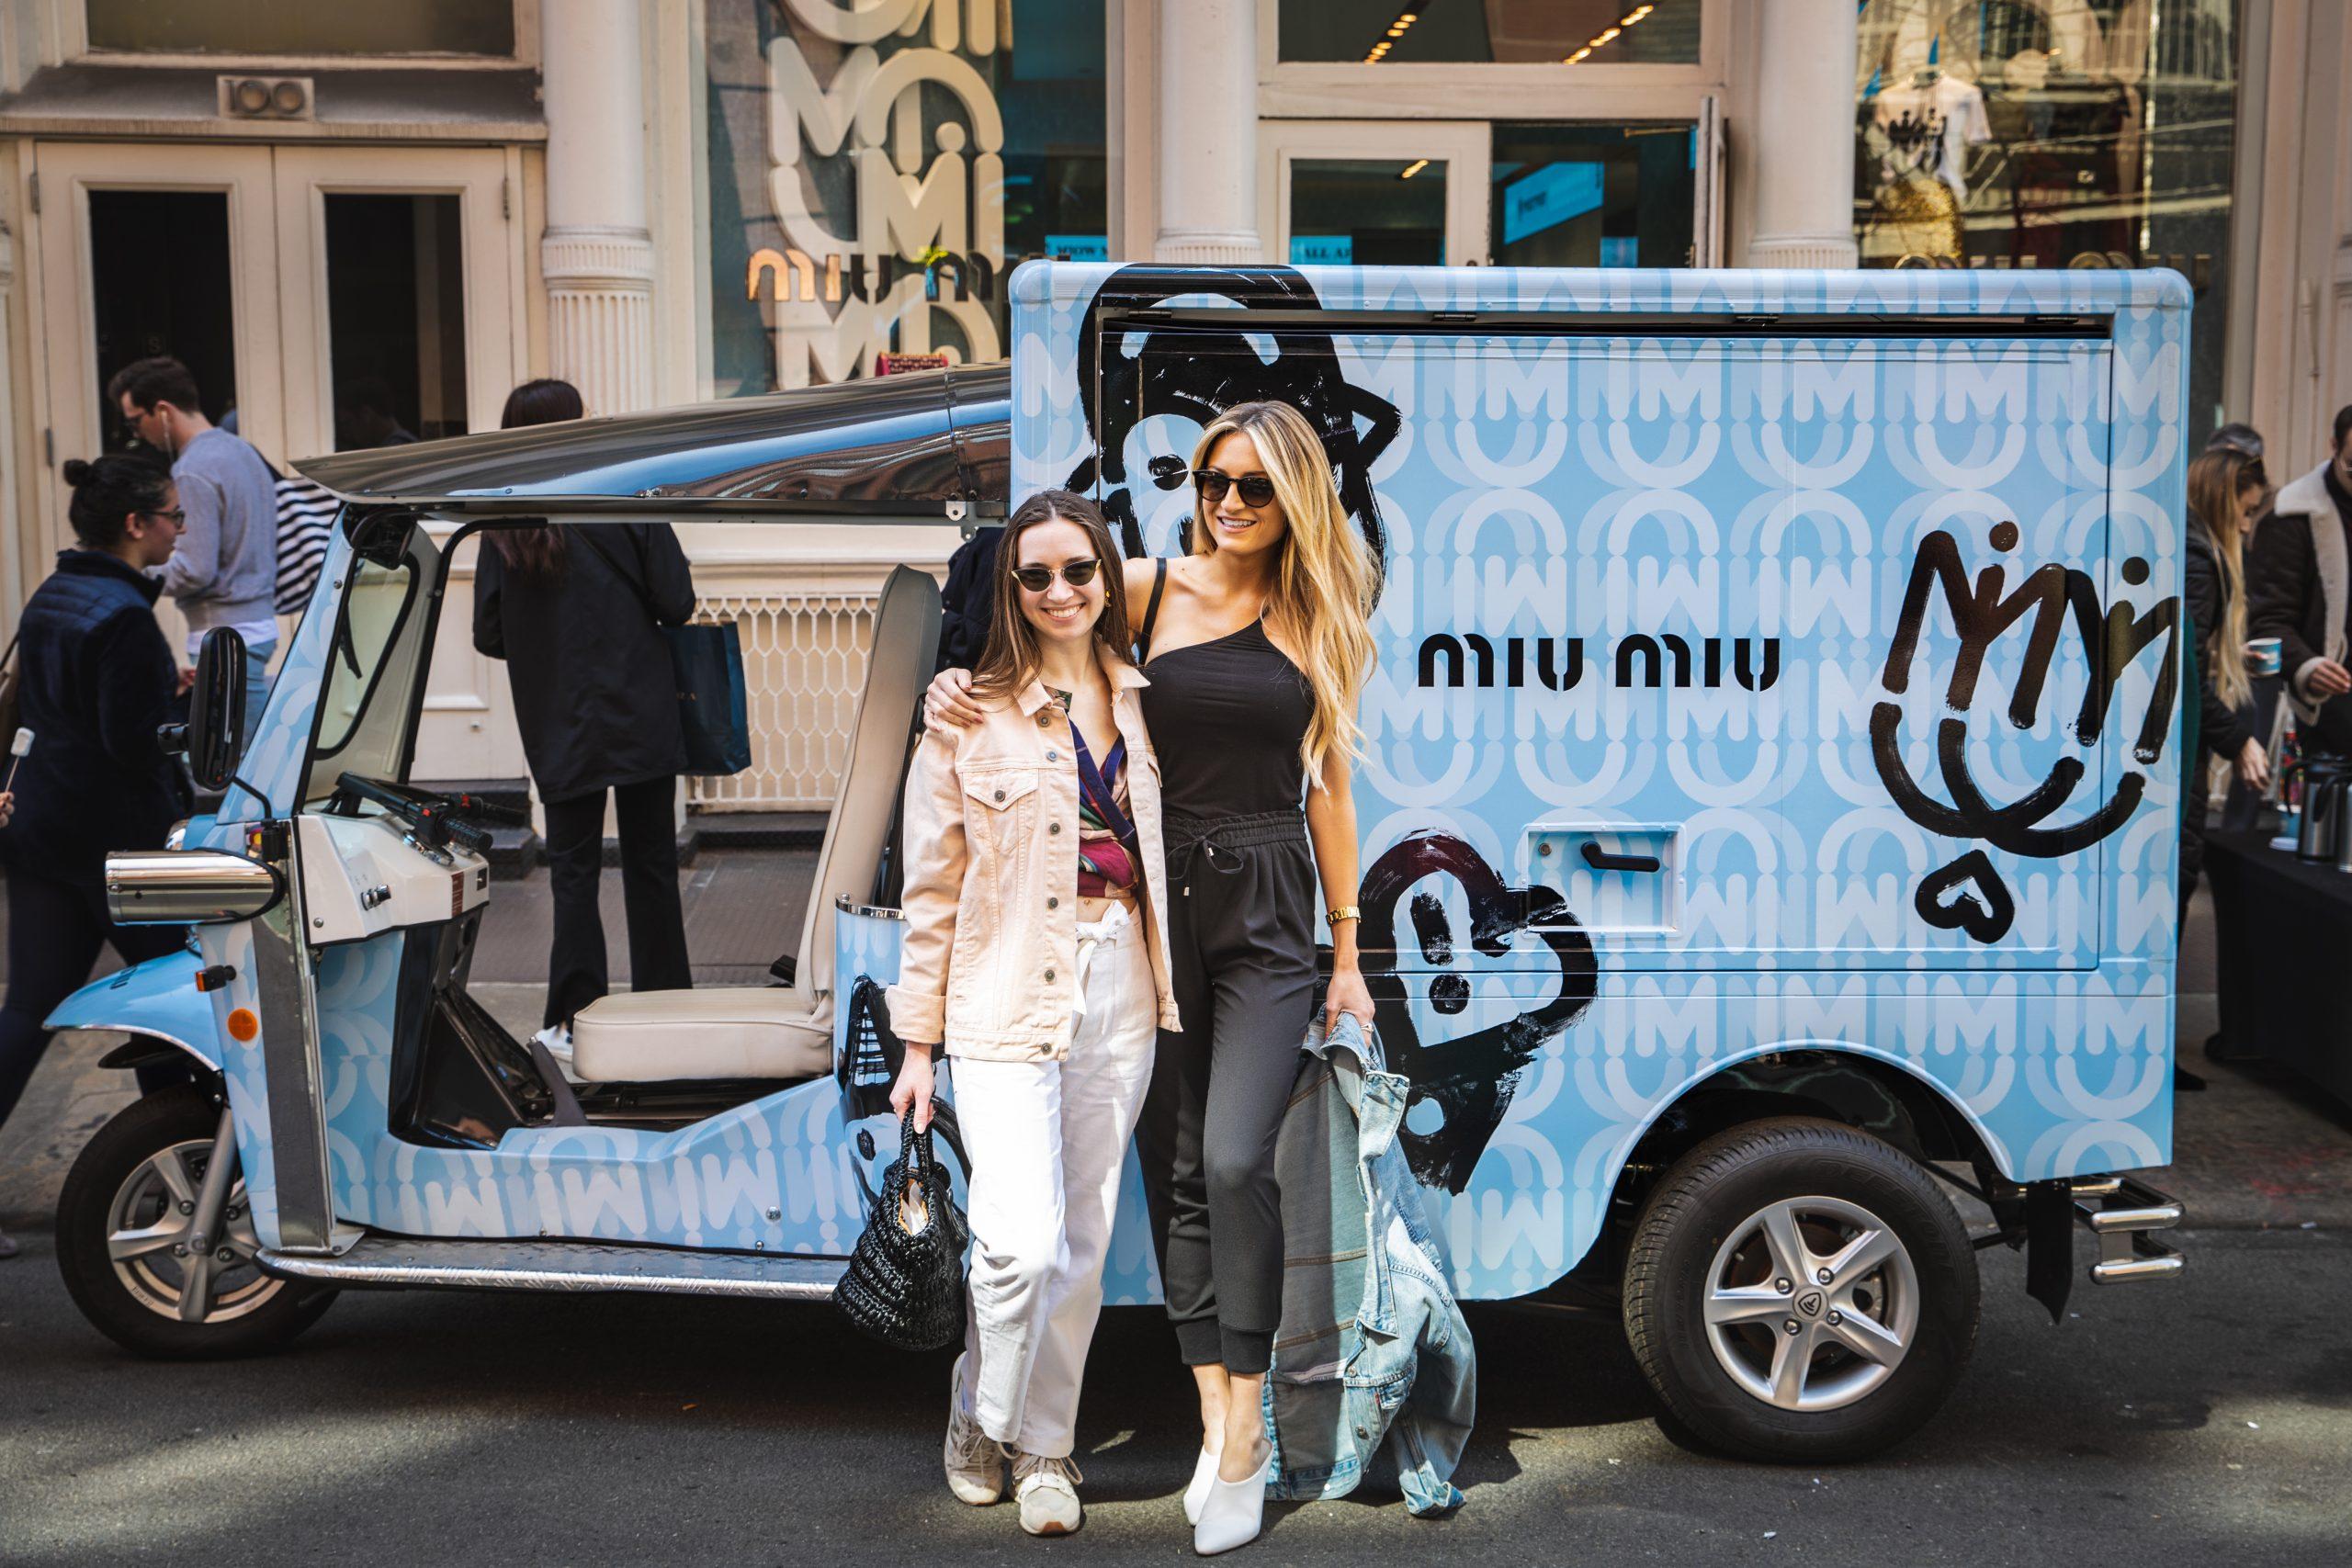 Miu Miu Mobile Marketing Vehicle